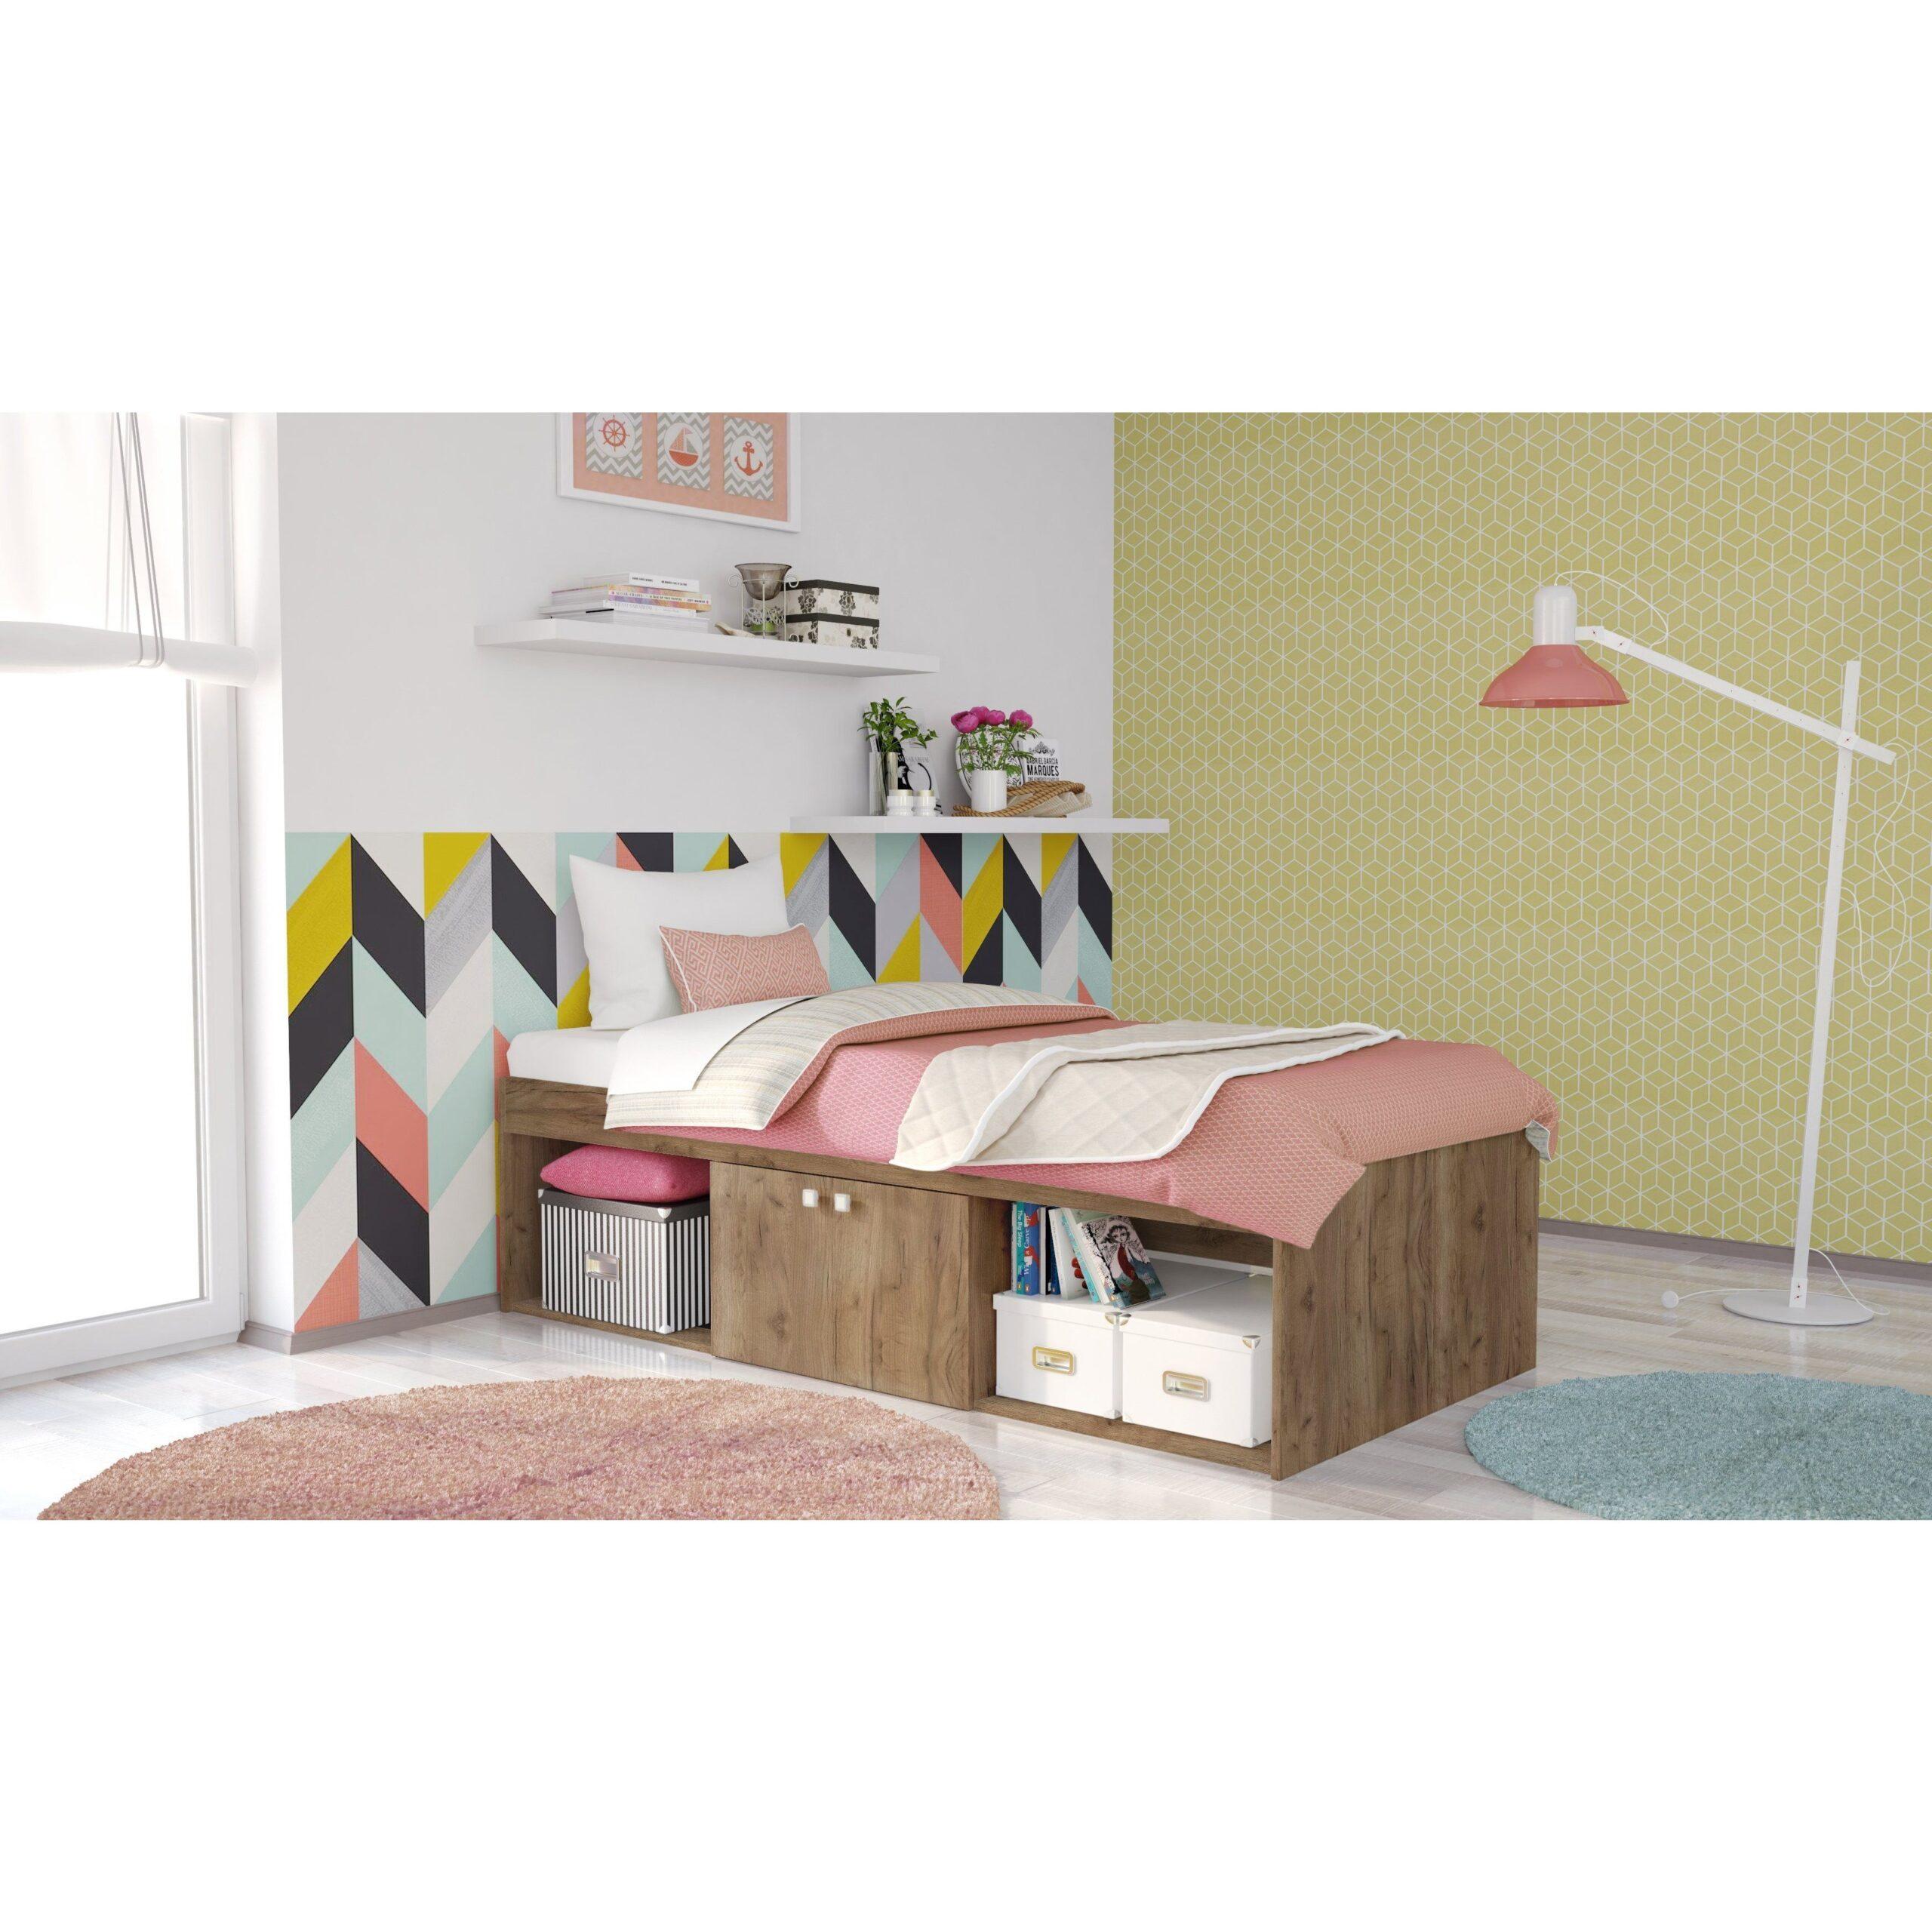 Full Size of Kinderbett Stauraum Polini Kids Jugendbett Stauraumbett Simple Grau Bett Mit 160x200 200x200 140x200 Betten Wohnzimmer Kinderbett Stauraum